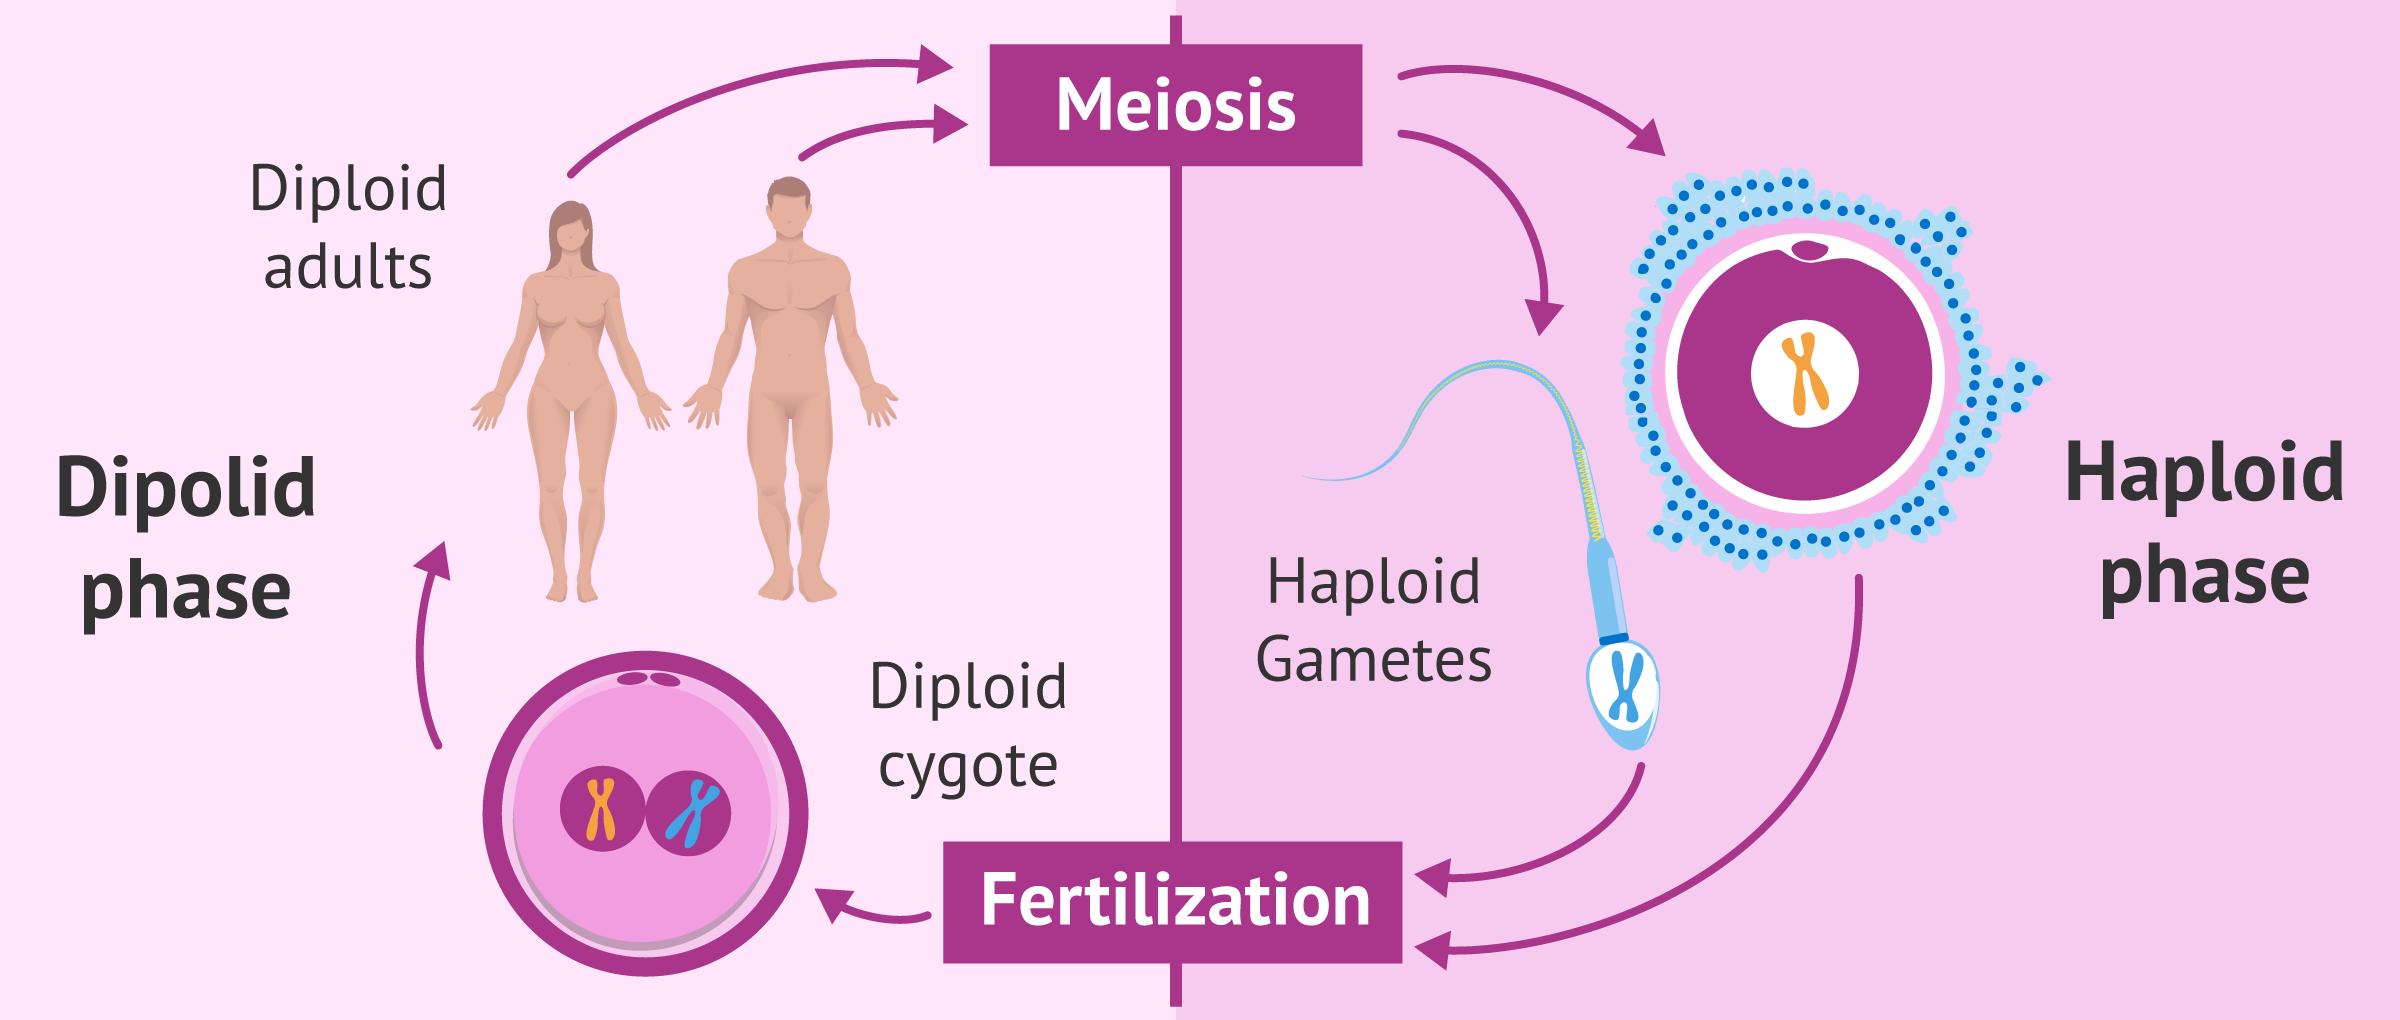 meiosis definition